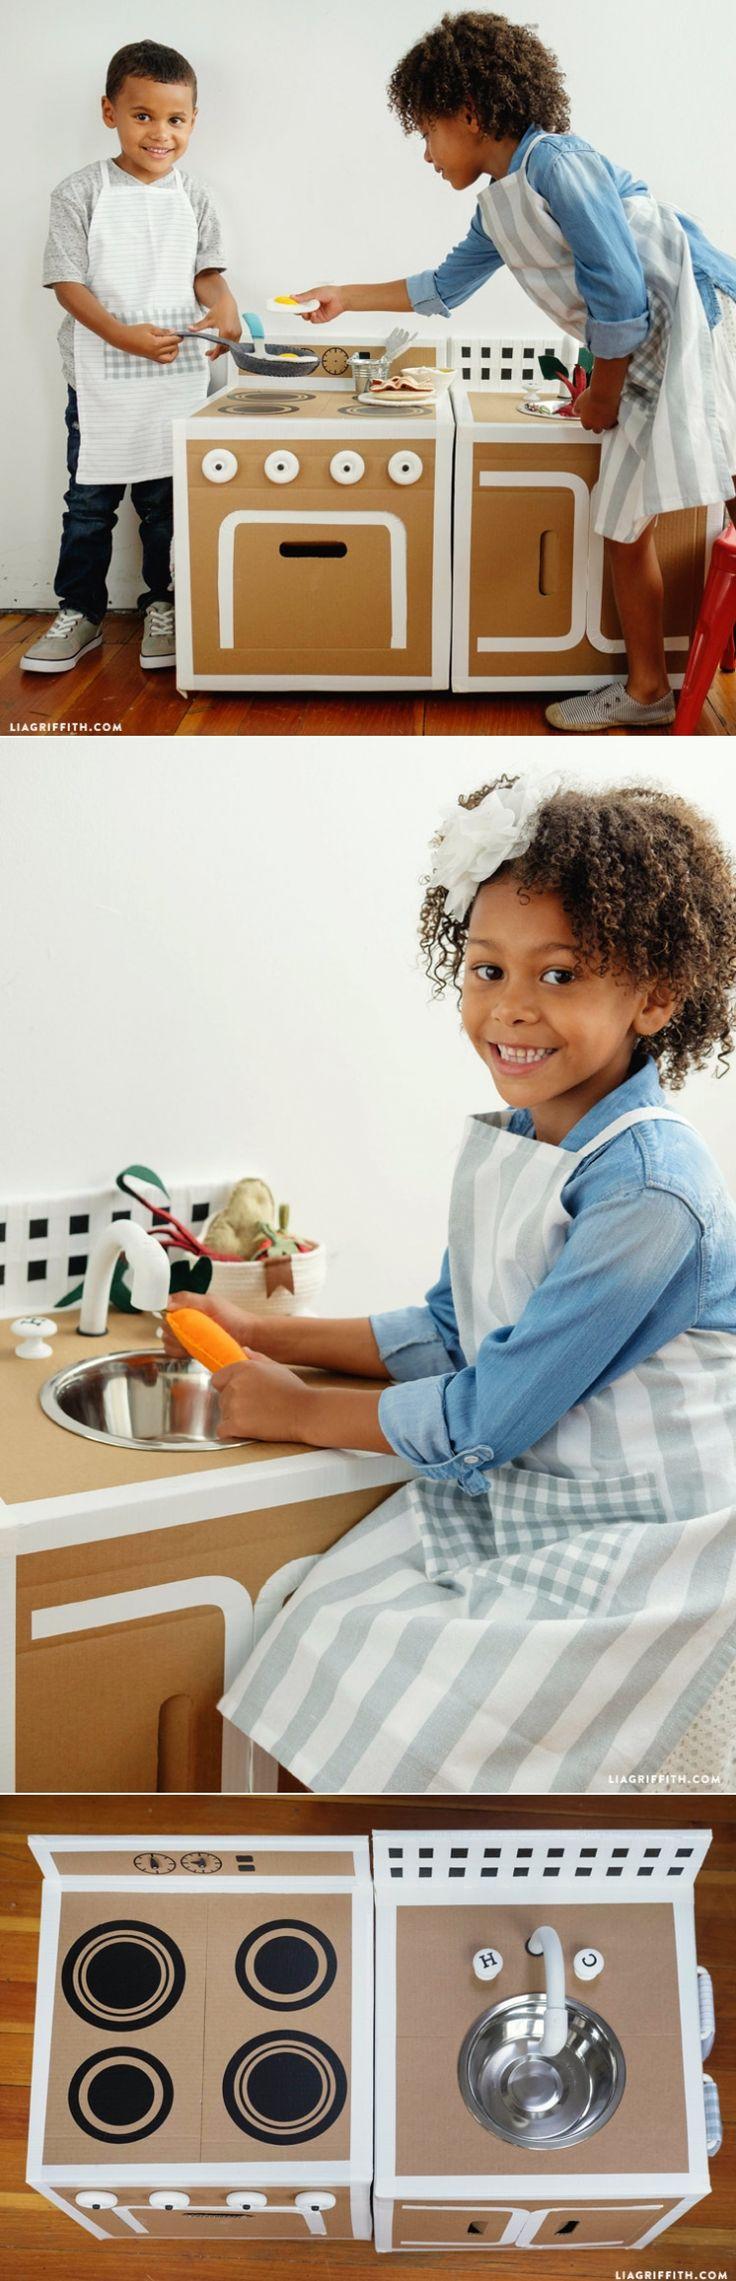 #Playkitchen #DIYToys #KidsToys www.LiaGriffith.com: